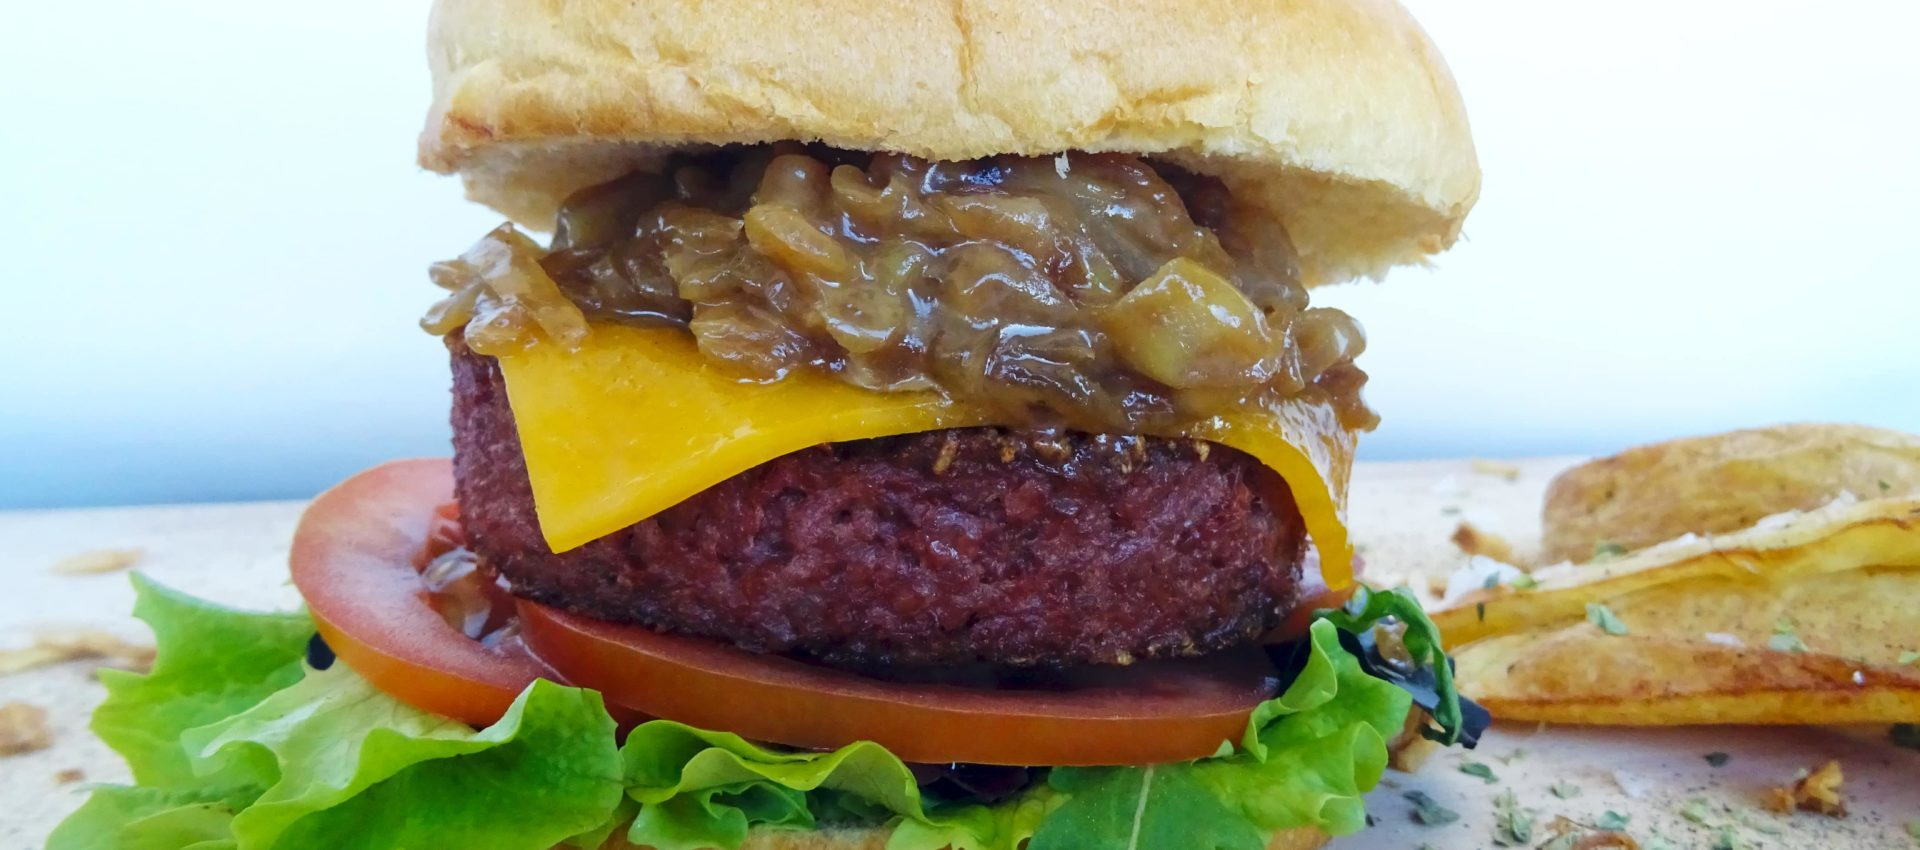 Hamburguesa Beyond Burger con cebolla